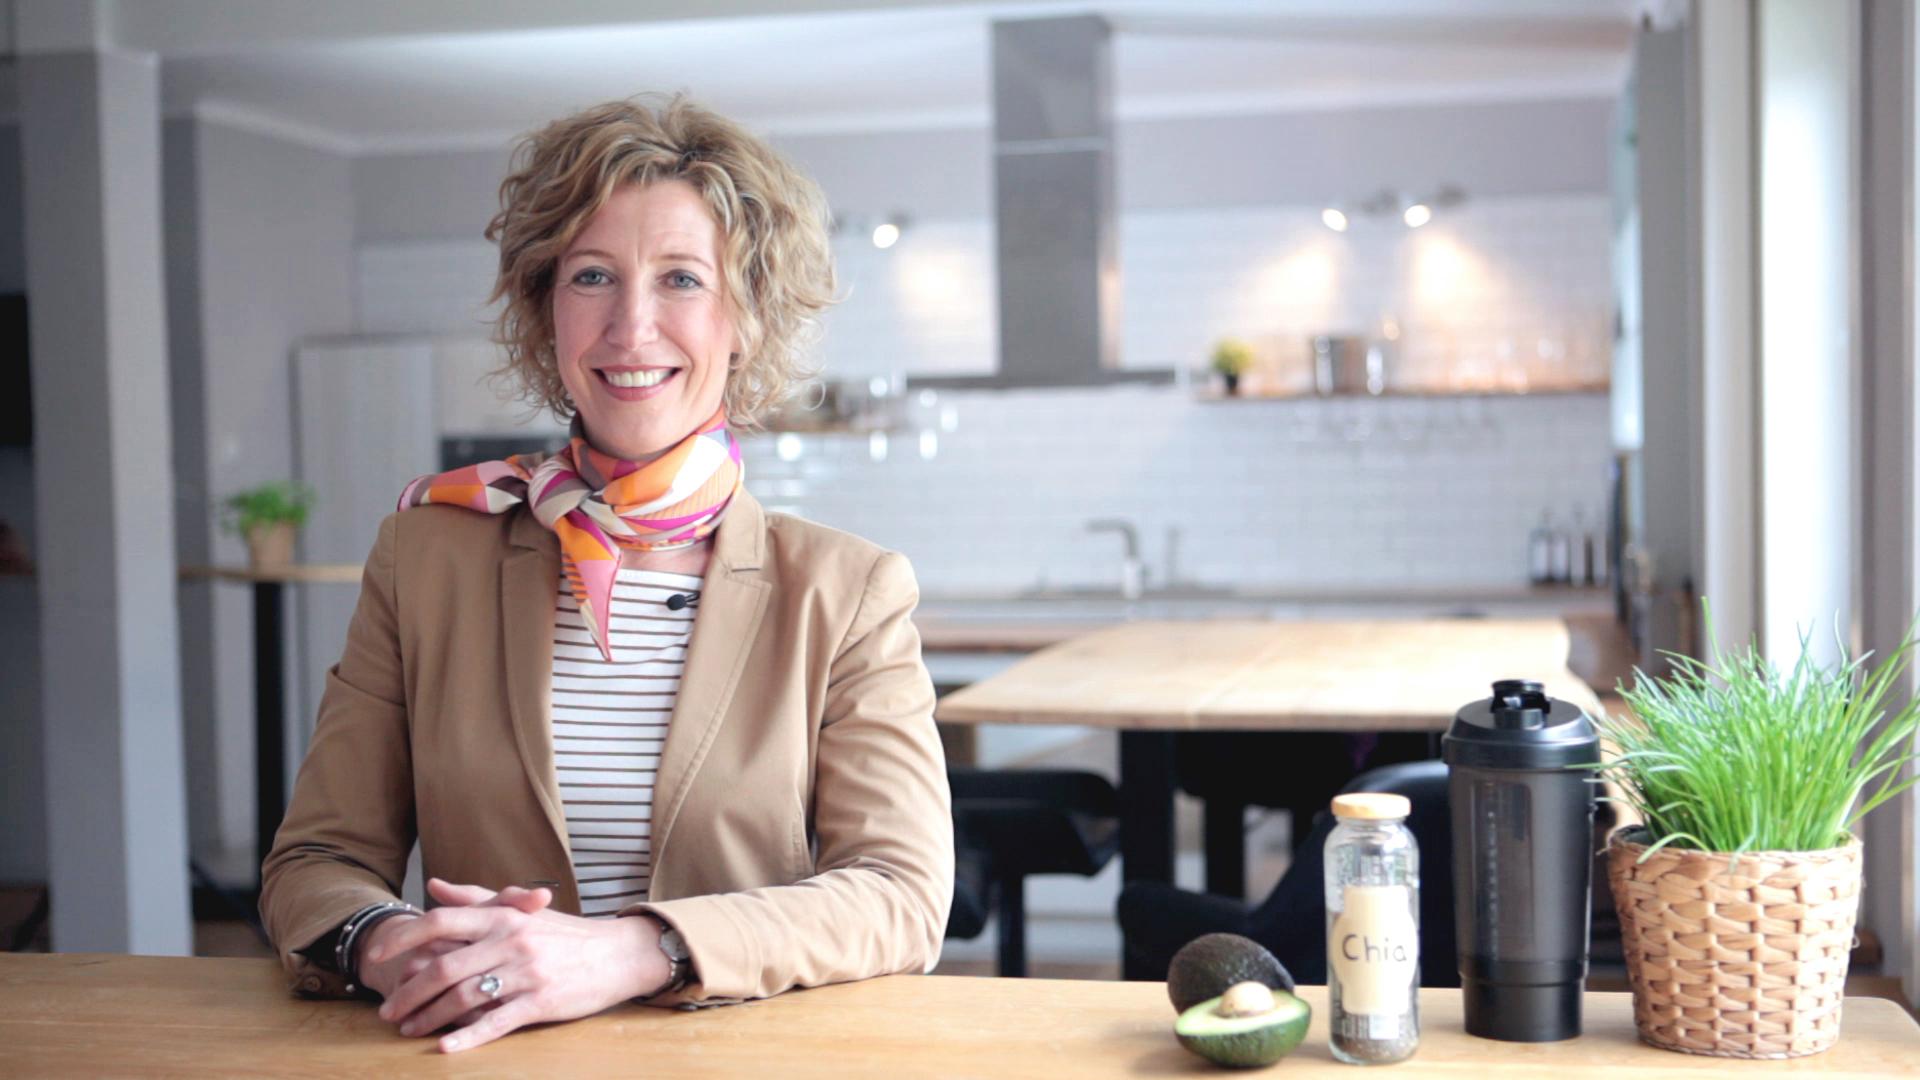 Heike-Niemeier-als-fitbase-Ernährungsexpertin-in-den-neuen-Expertenvideos